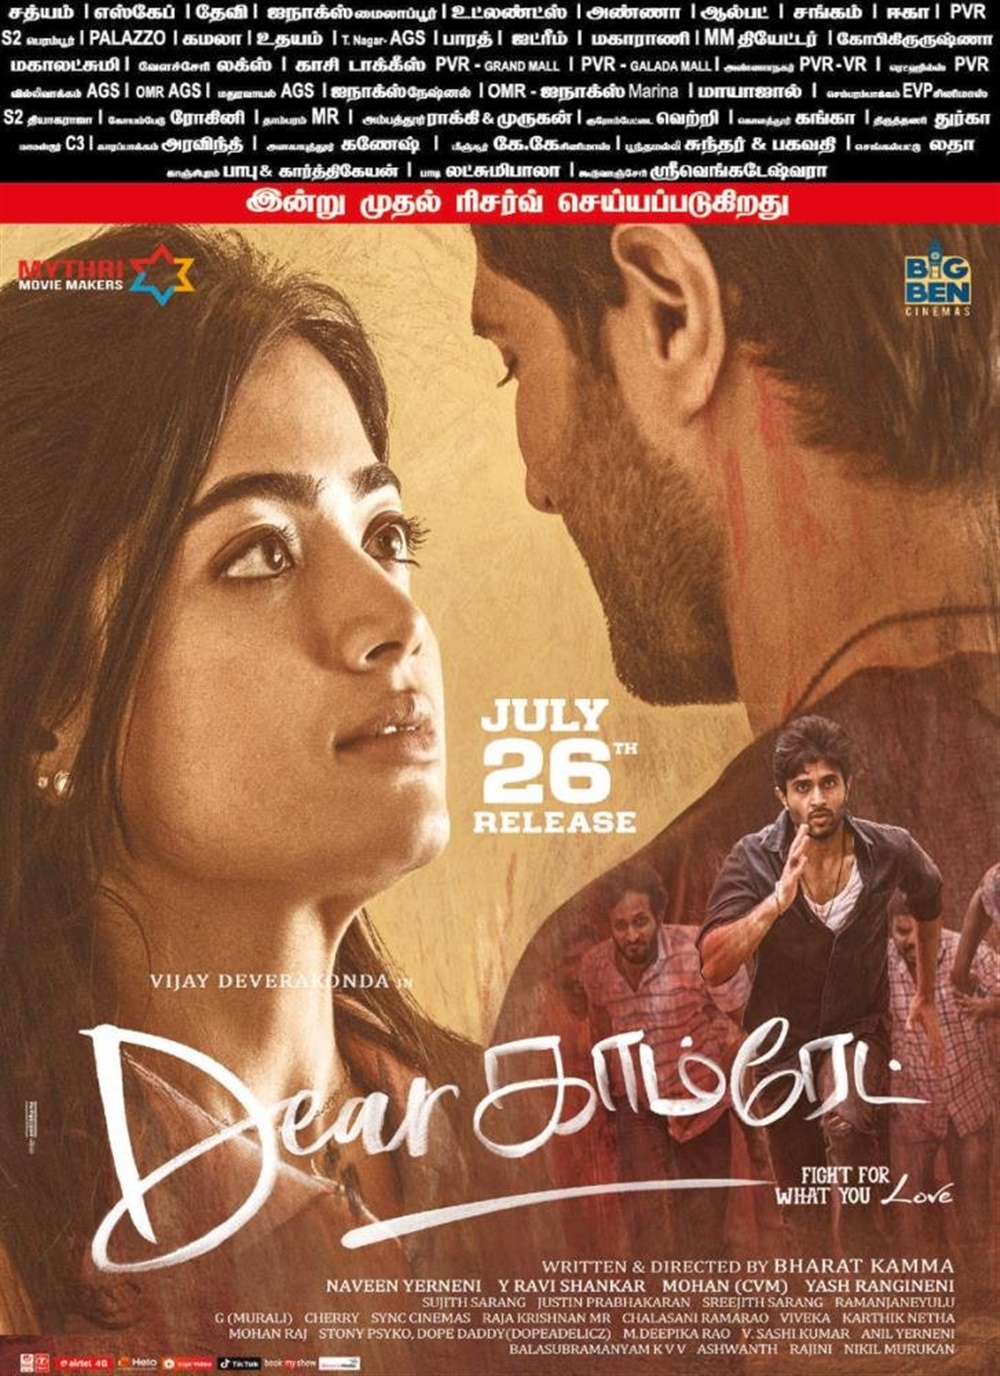 Rashmika Mandanna Vijay Devarakonda Dear Comrade Tamil Movie Release Posters